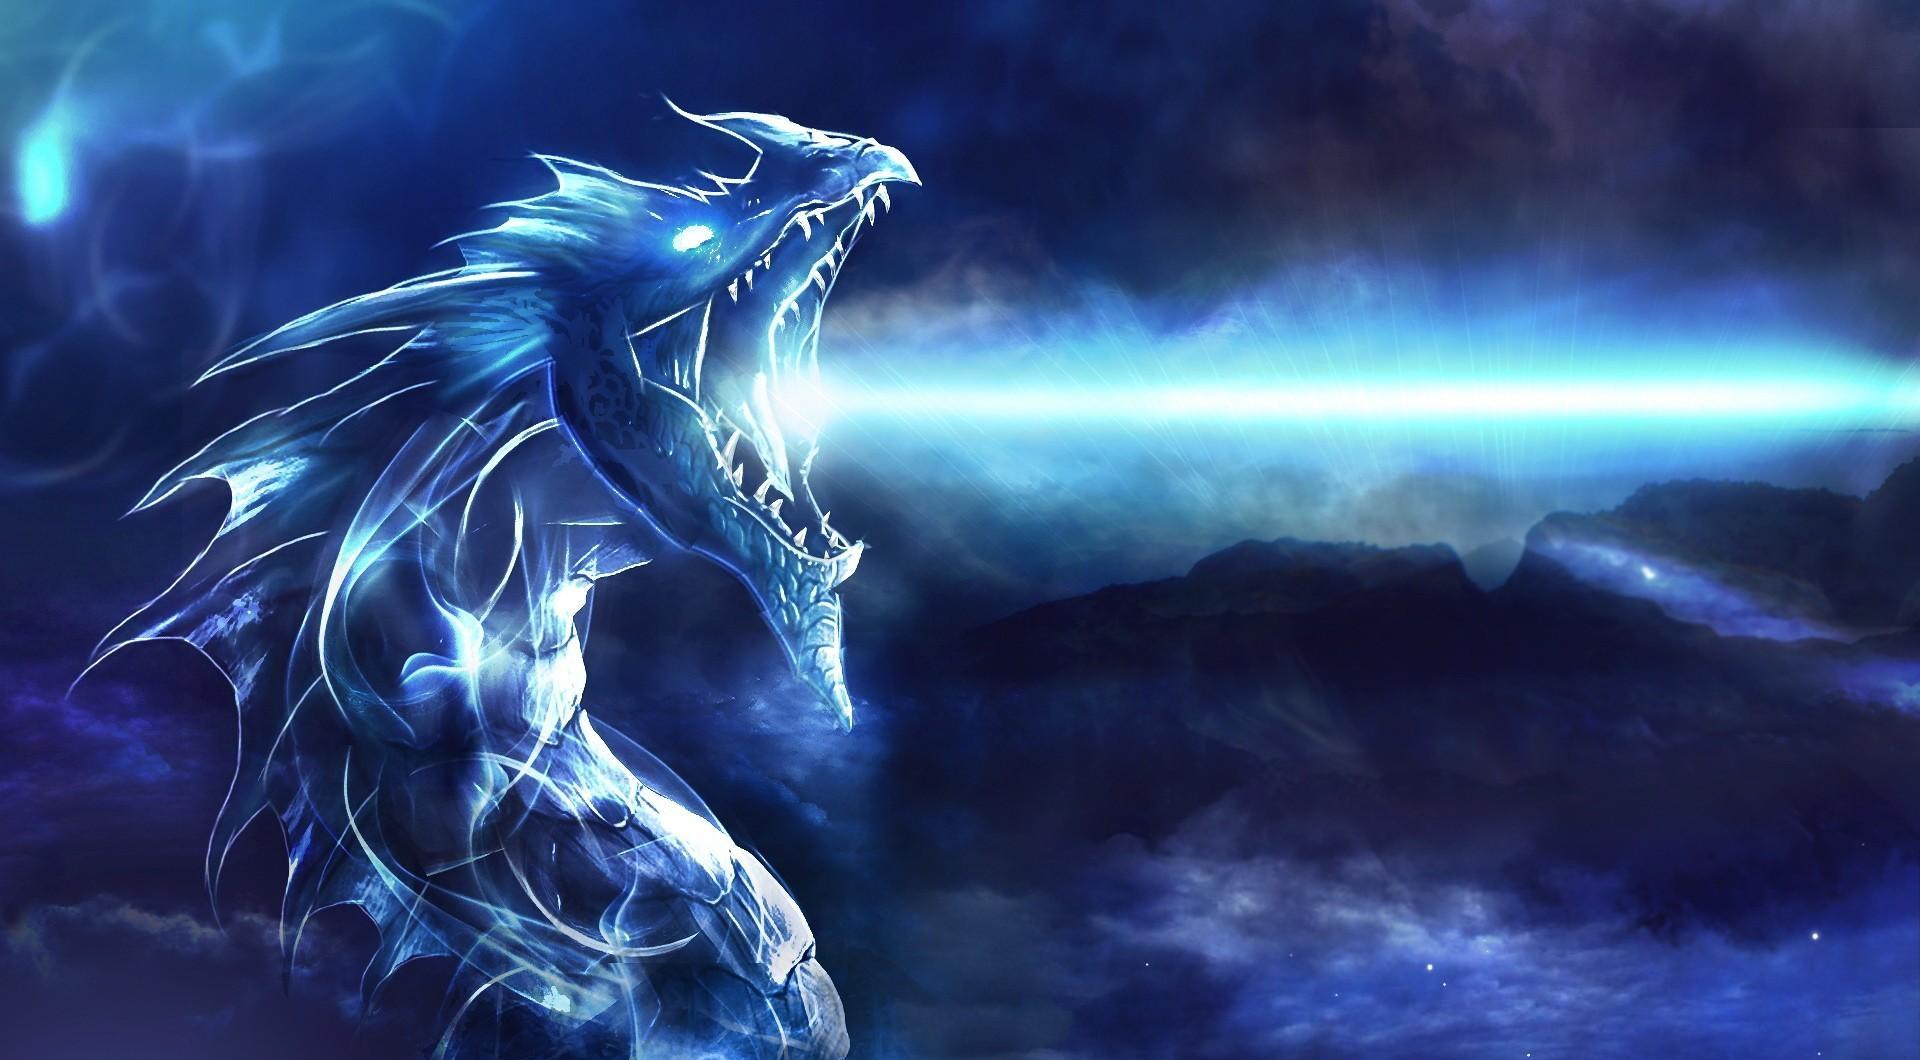 Dragon pictures for desktop Top 50 HD Dragon Wallpapers, Images, Backgrounds, Desktop